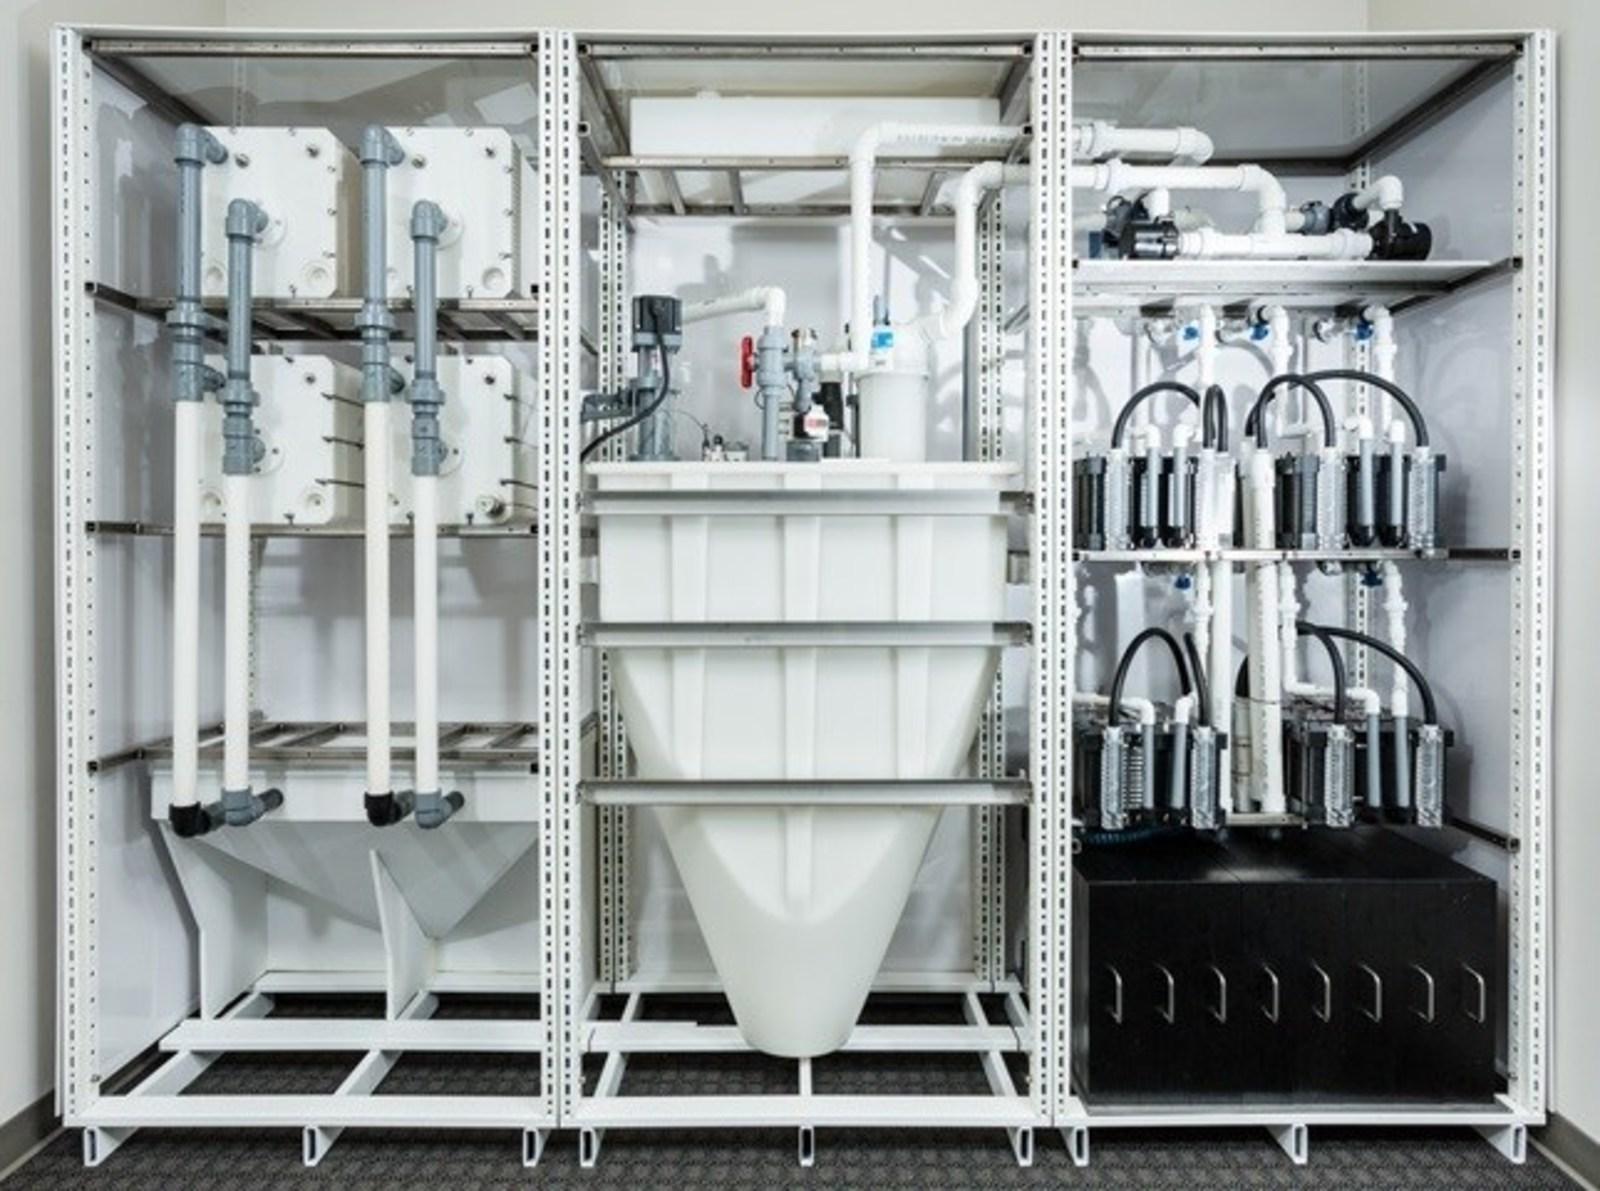 Figure 1. MGXR modular Energy Storage System